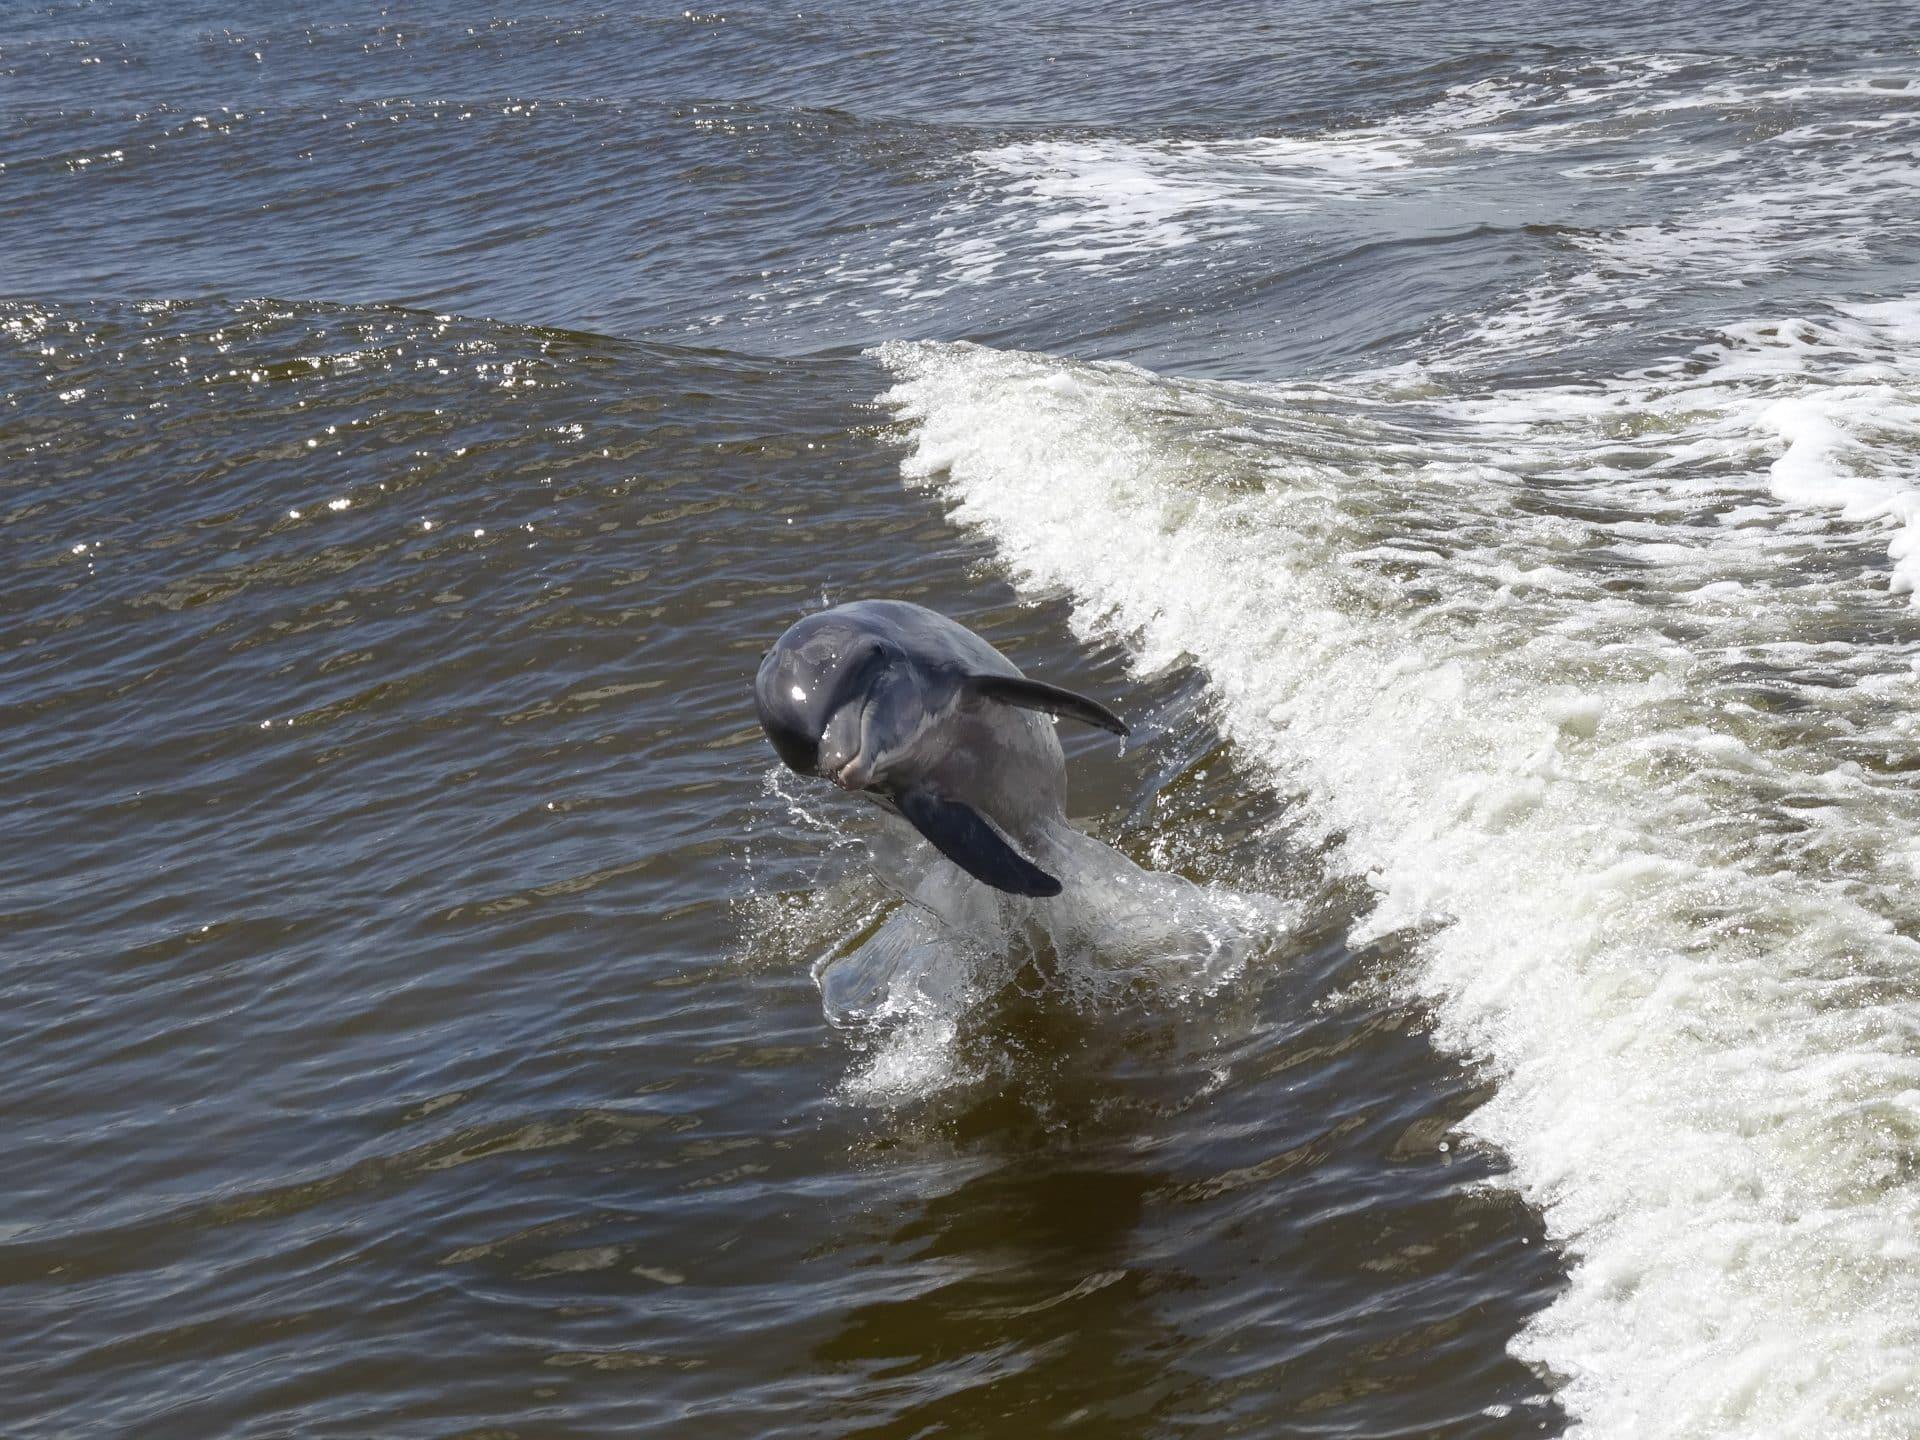 10000 Islands dauphin road trip Floride